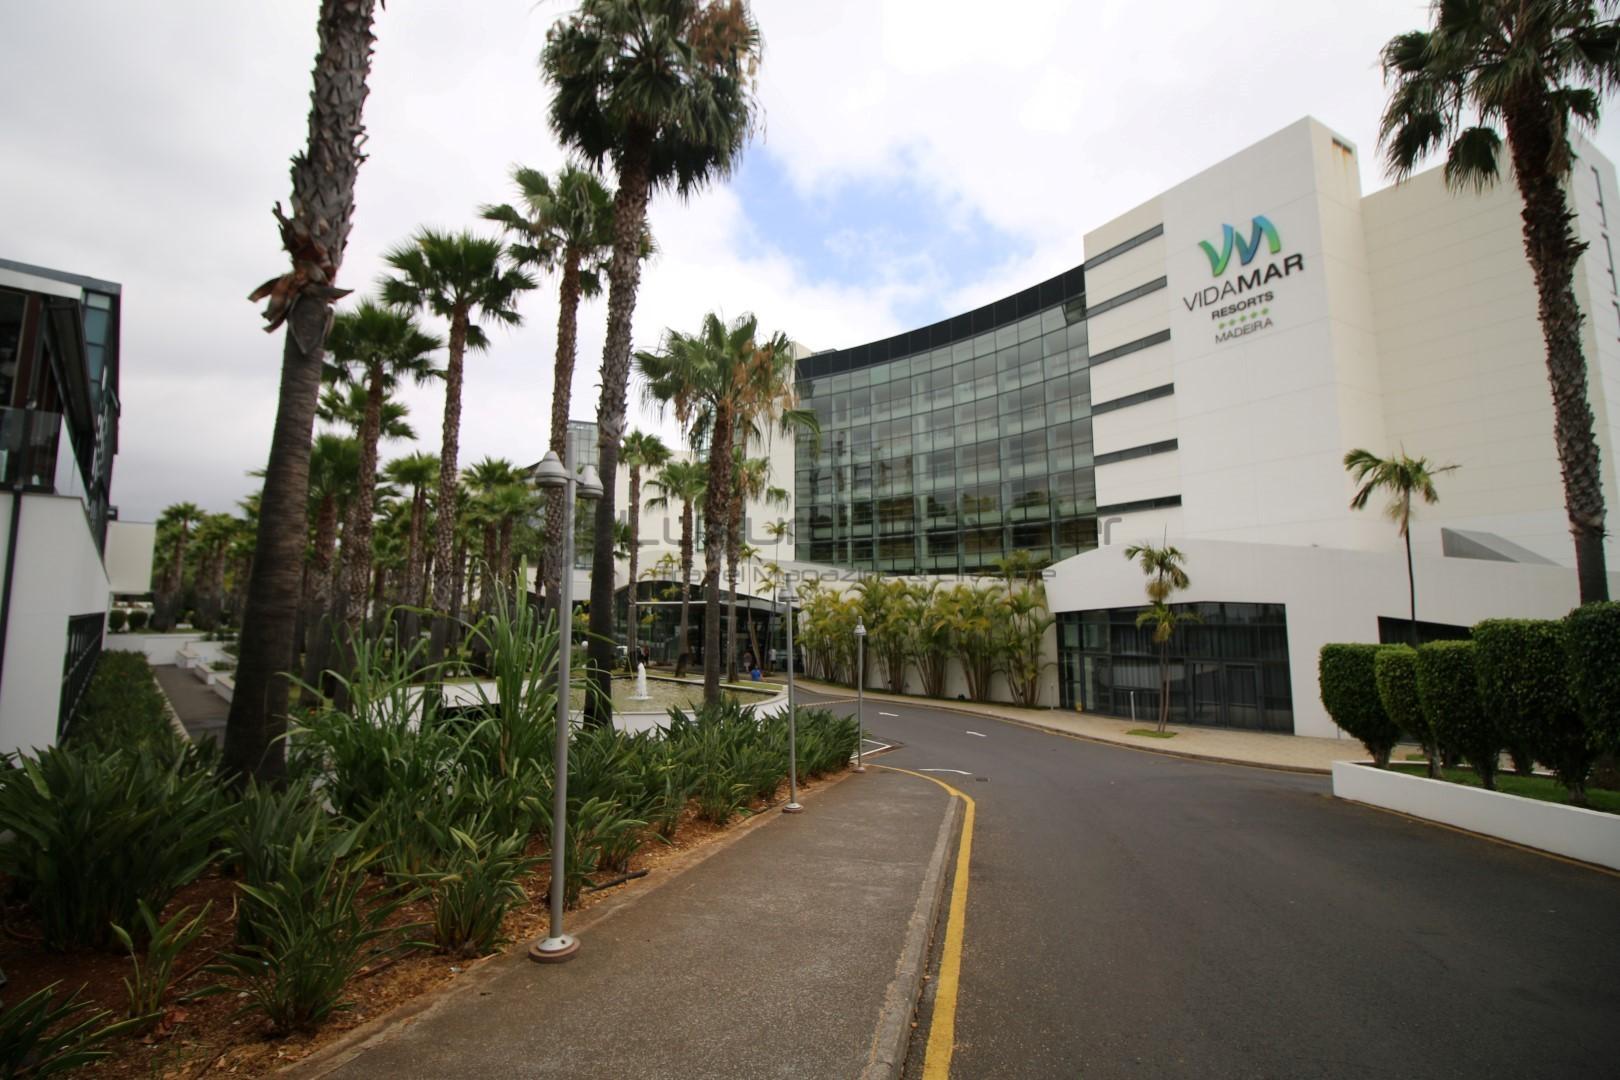 Vidamar_Madeira_Resorts_Funchal